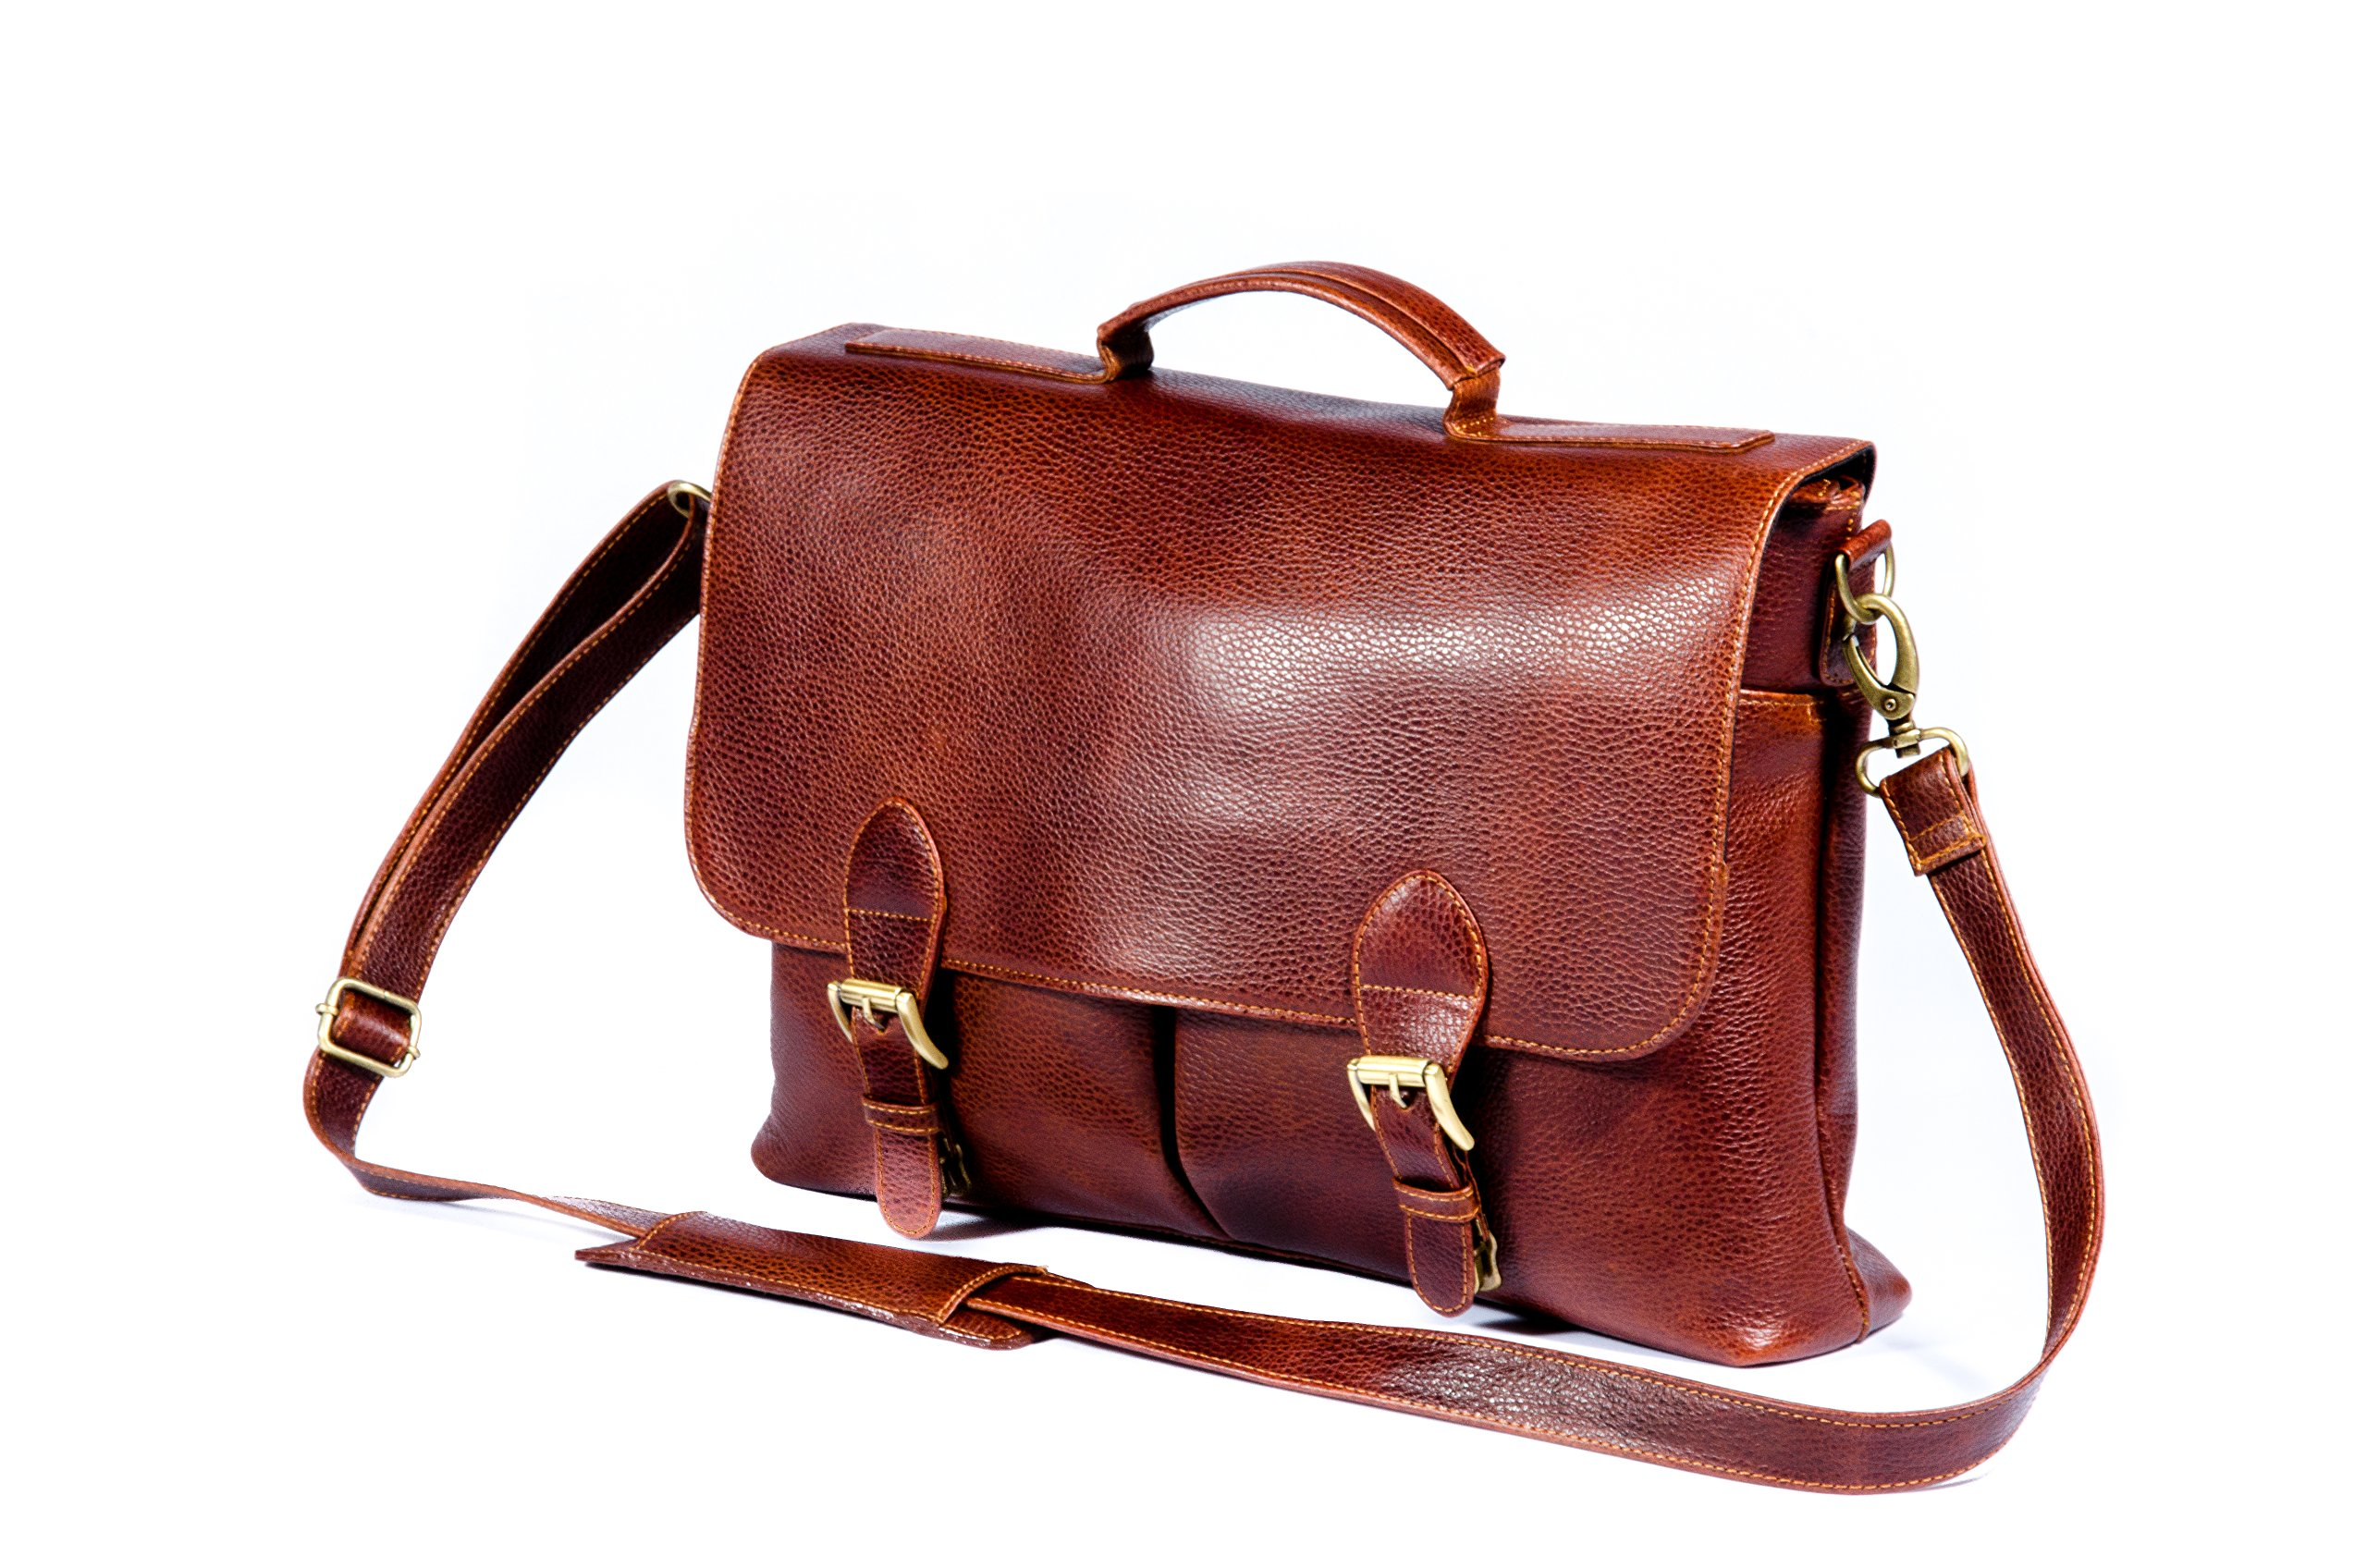 Cross Body Shoulder Leather Messenger Bag for men | Laptop Briefcase Work Office Bag | Durable & Stylish Satchel Bag by MA&B